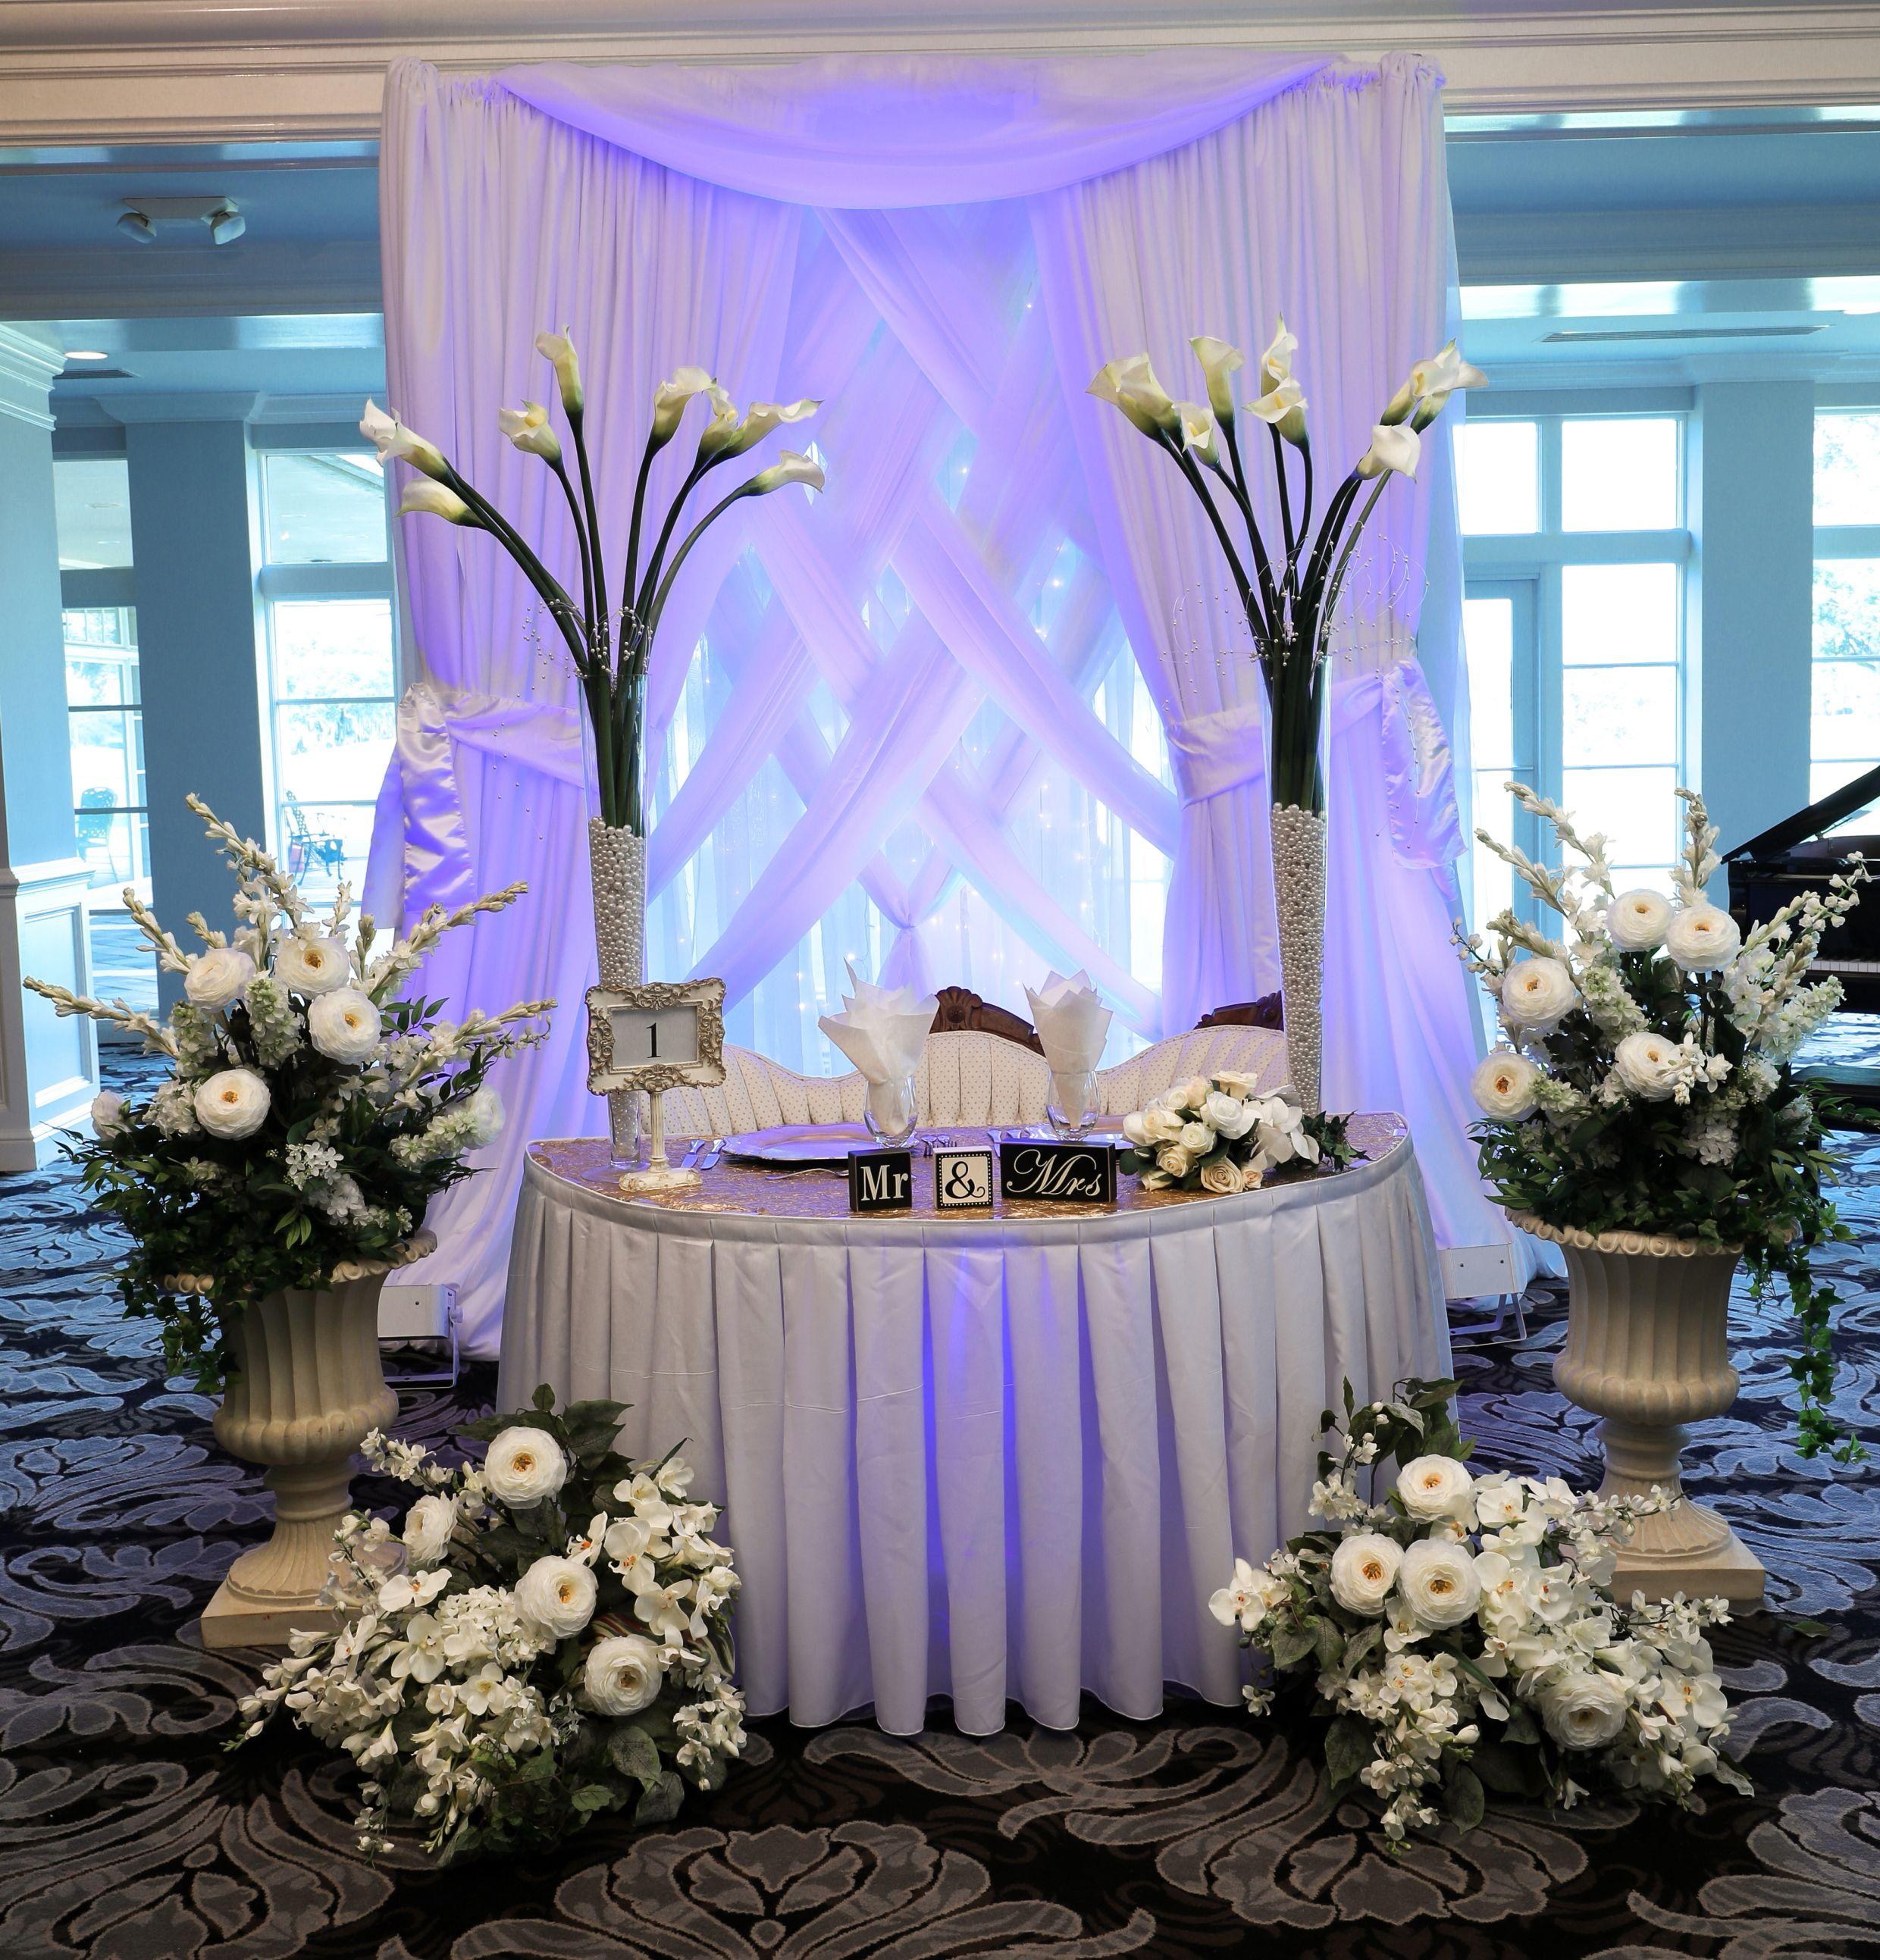 Siesta Key Beach Wedding Ceremony: Pin By Beach Breeze Weddings On Reception Design